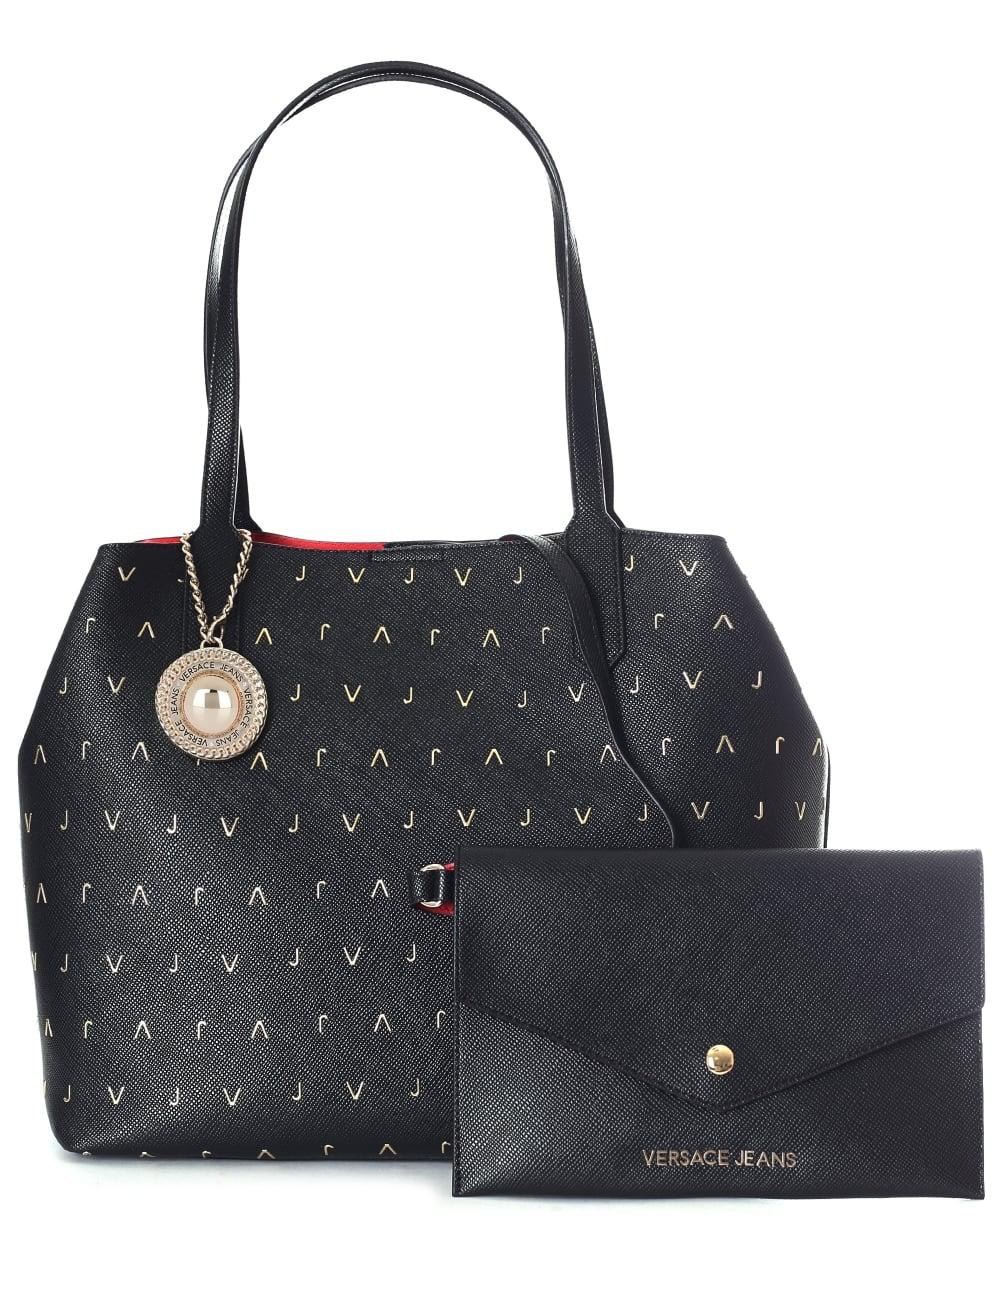 e9ab64c83 Versace Jeans Repeat Metallic 'VJ' Logo Women's Tote Bag Black